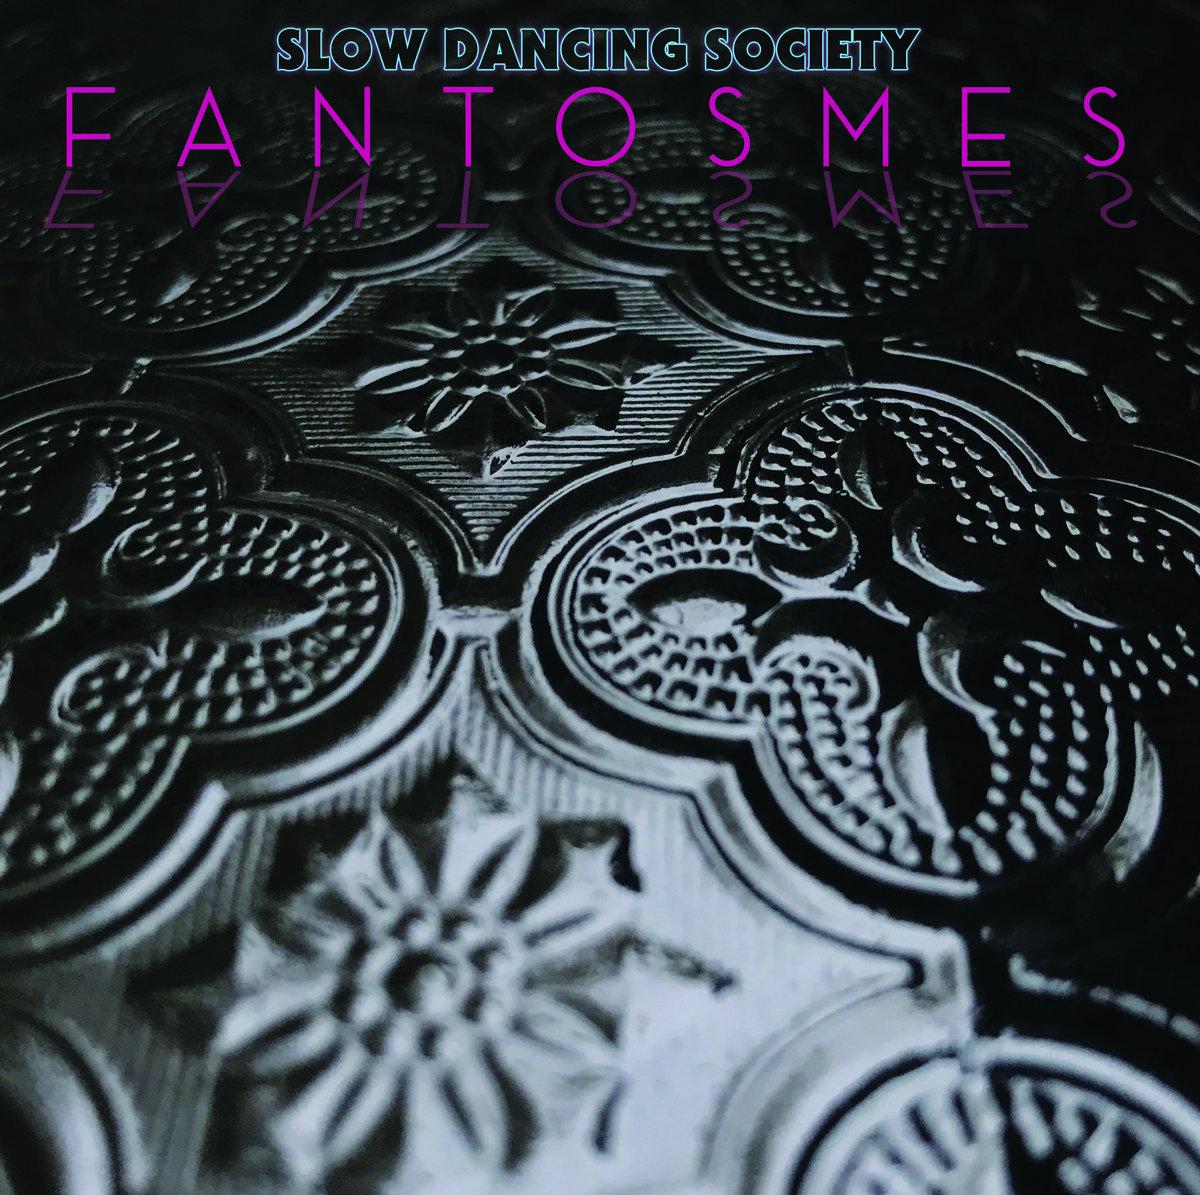 9. Slow Dancing Society - Fantosmes